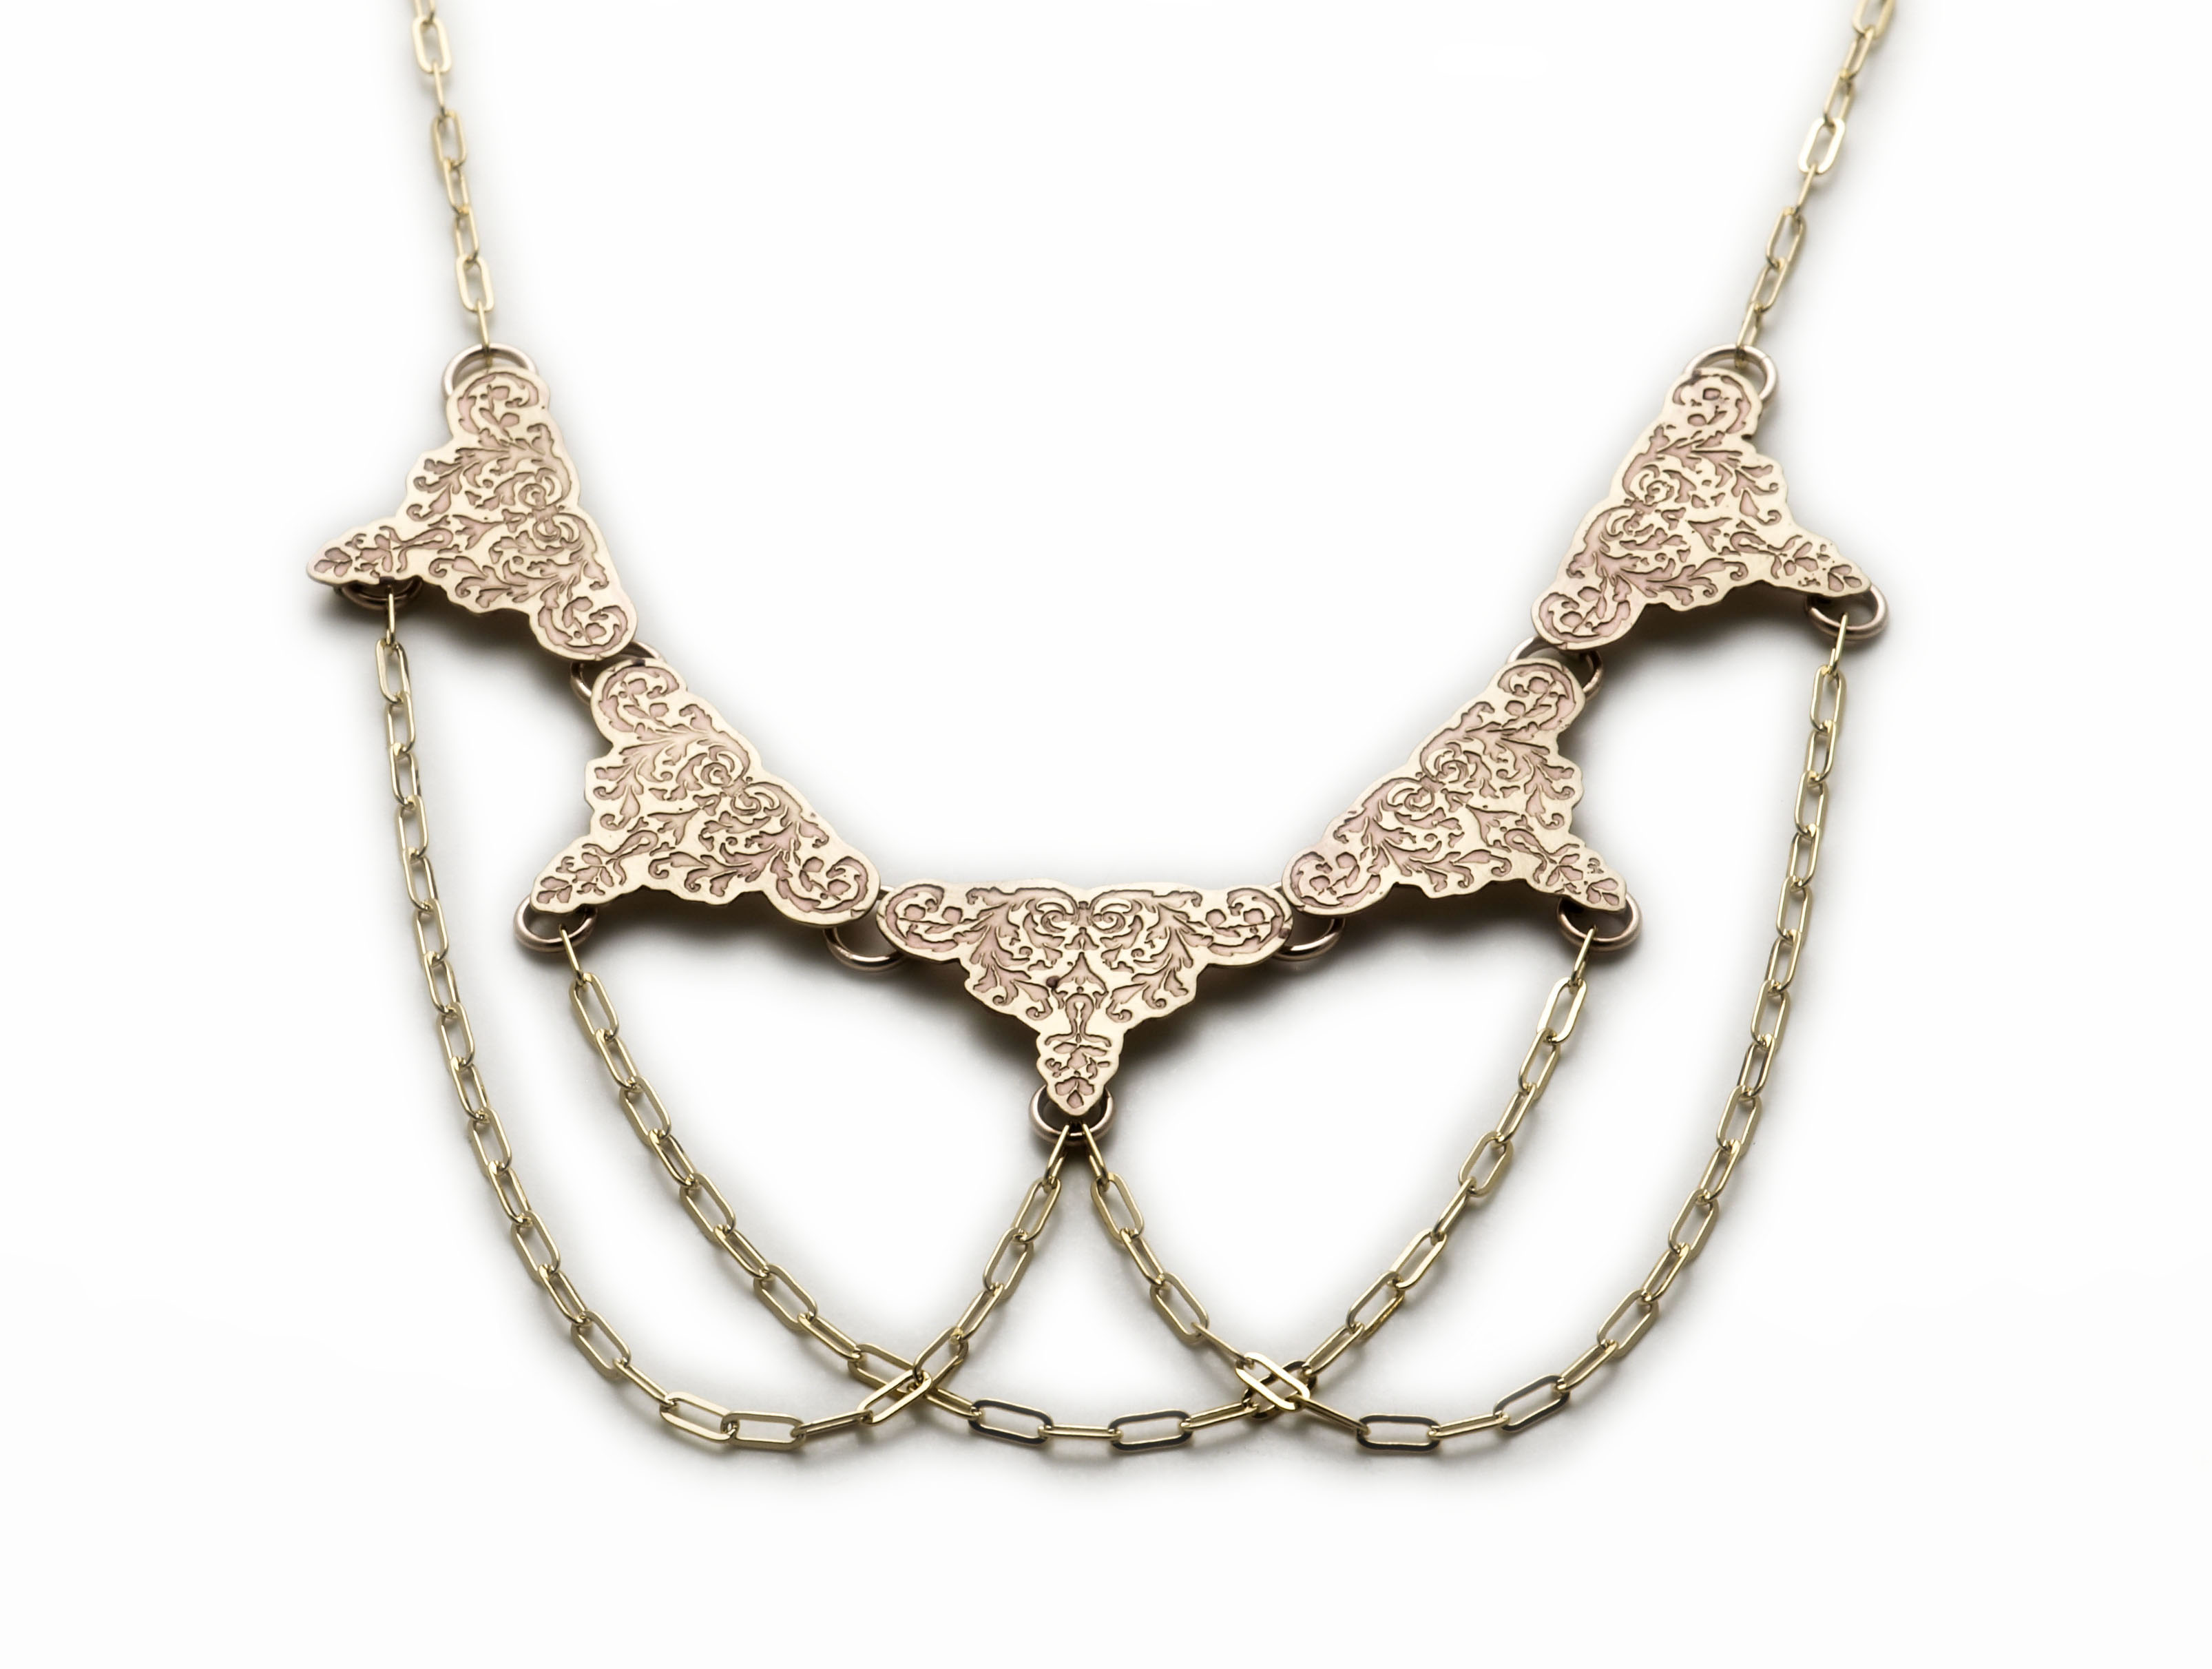 Verge Necklace